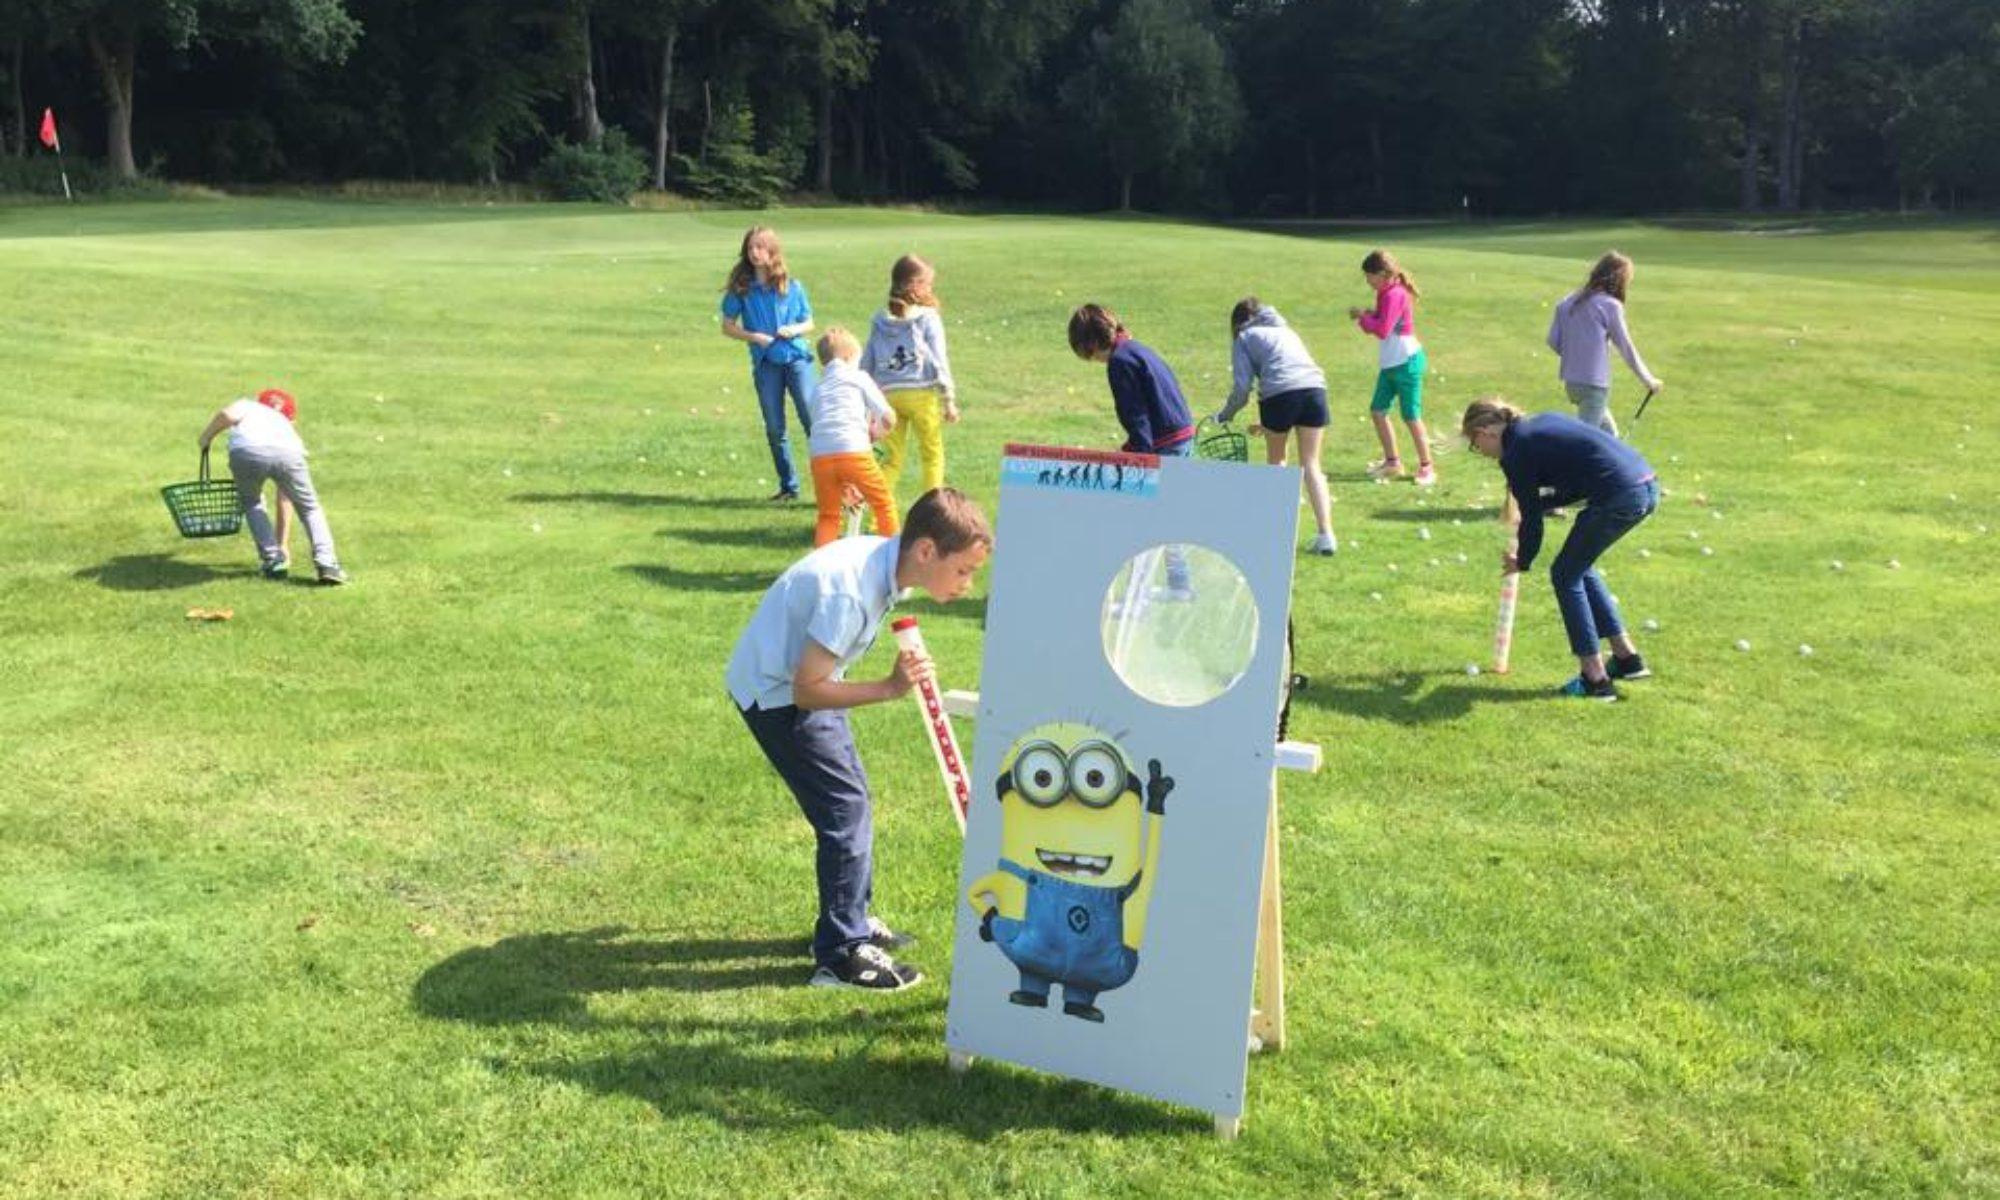 GolfSchool Luxembourg